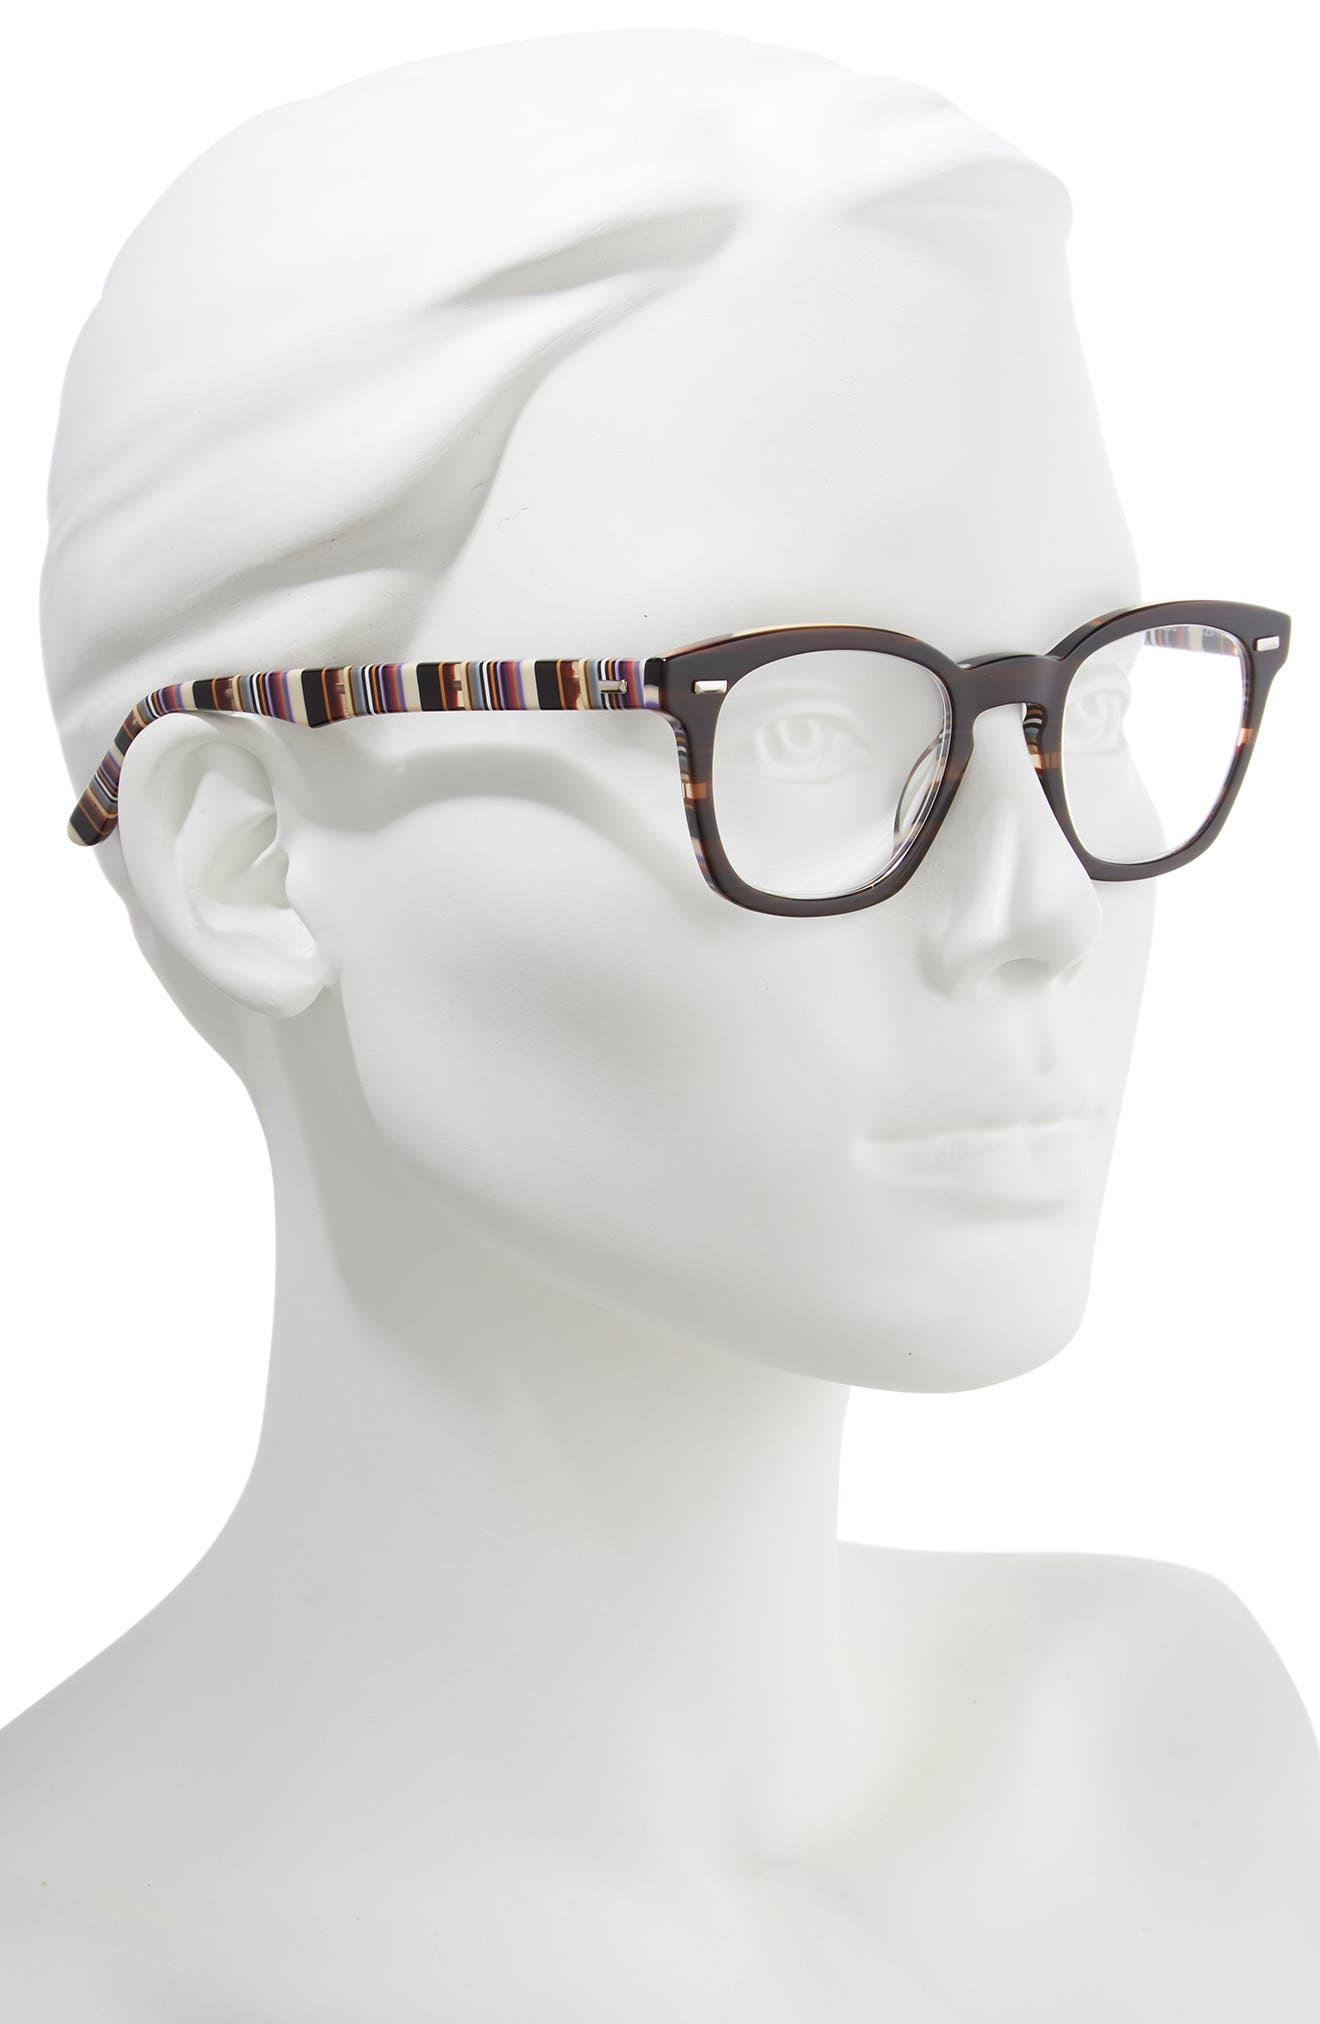 CORINNE MCCORMACK, 'Annie' 46mm Reading Glasses, Alternate thumbnail 2, color, BROWN/ STRIPE